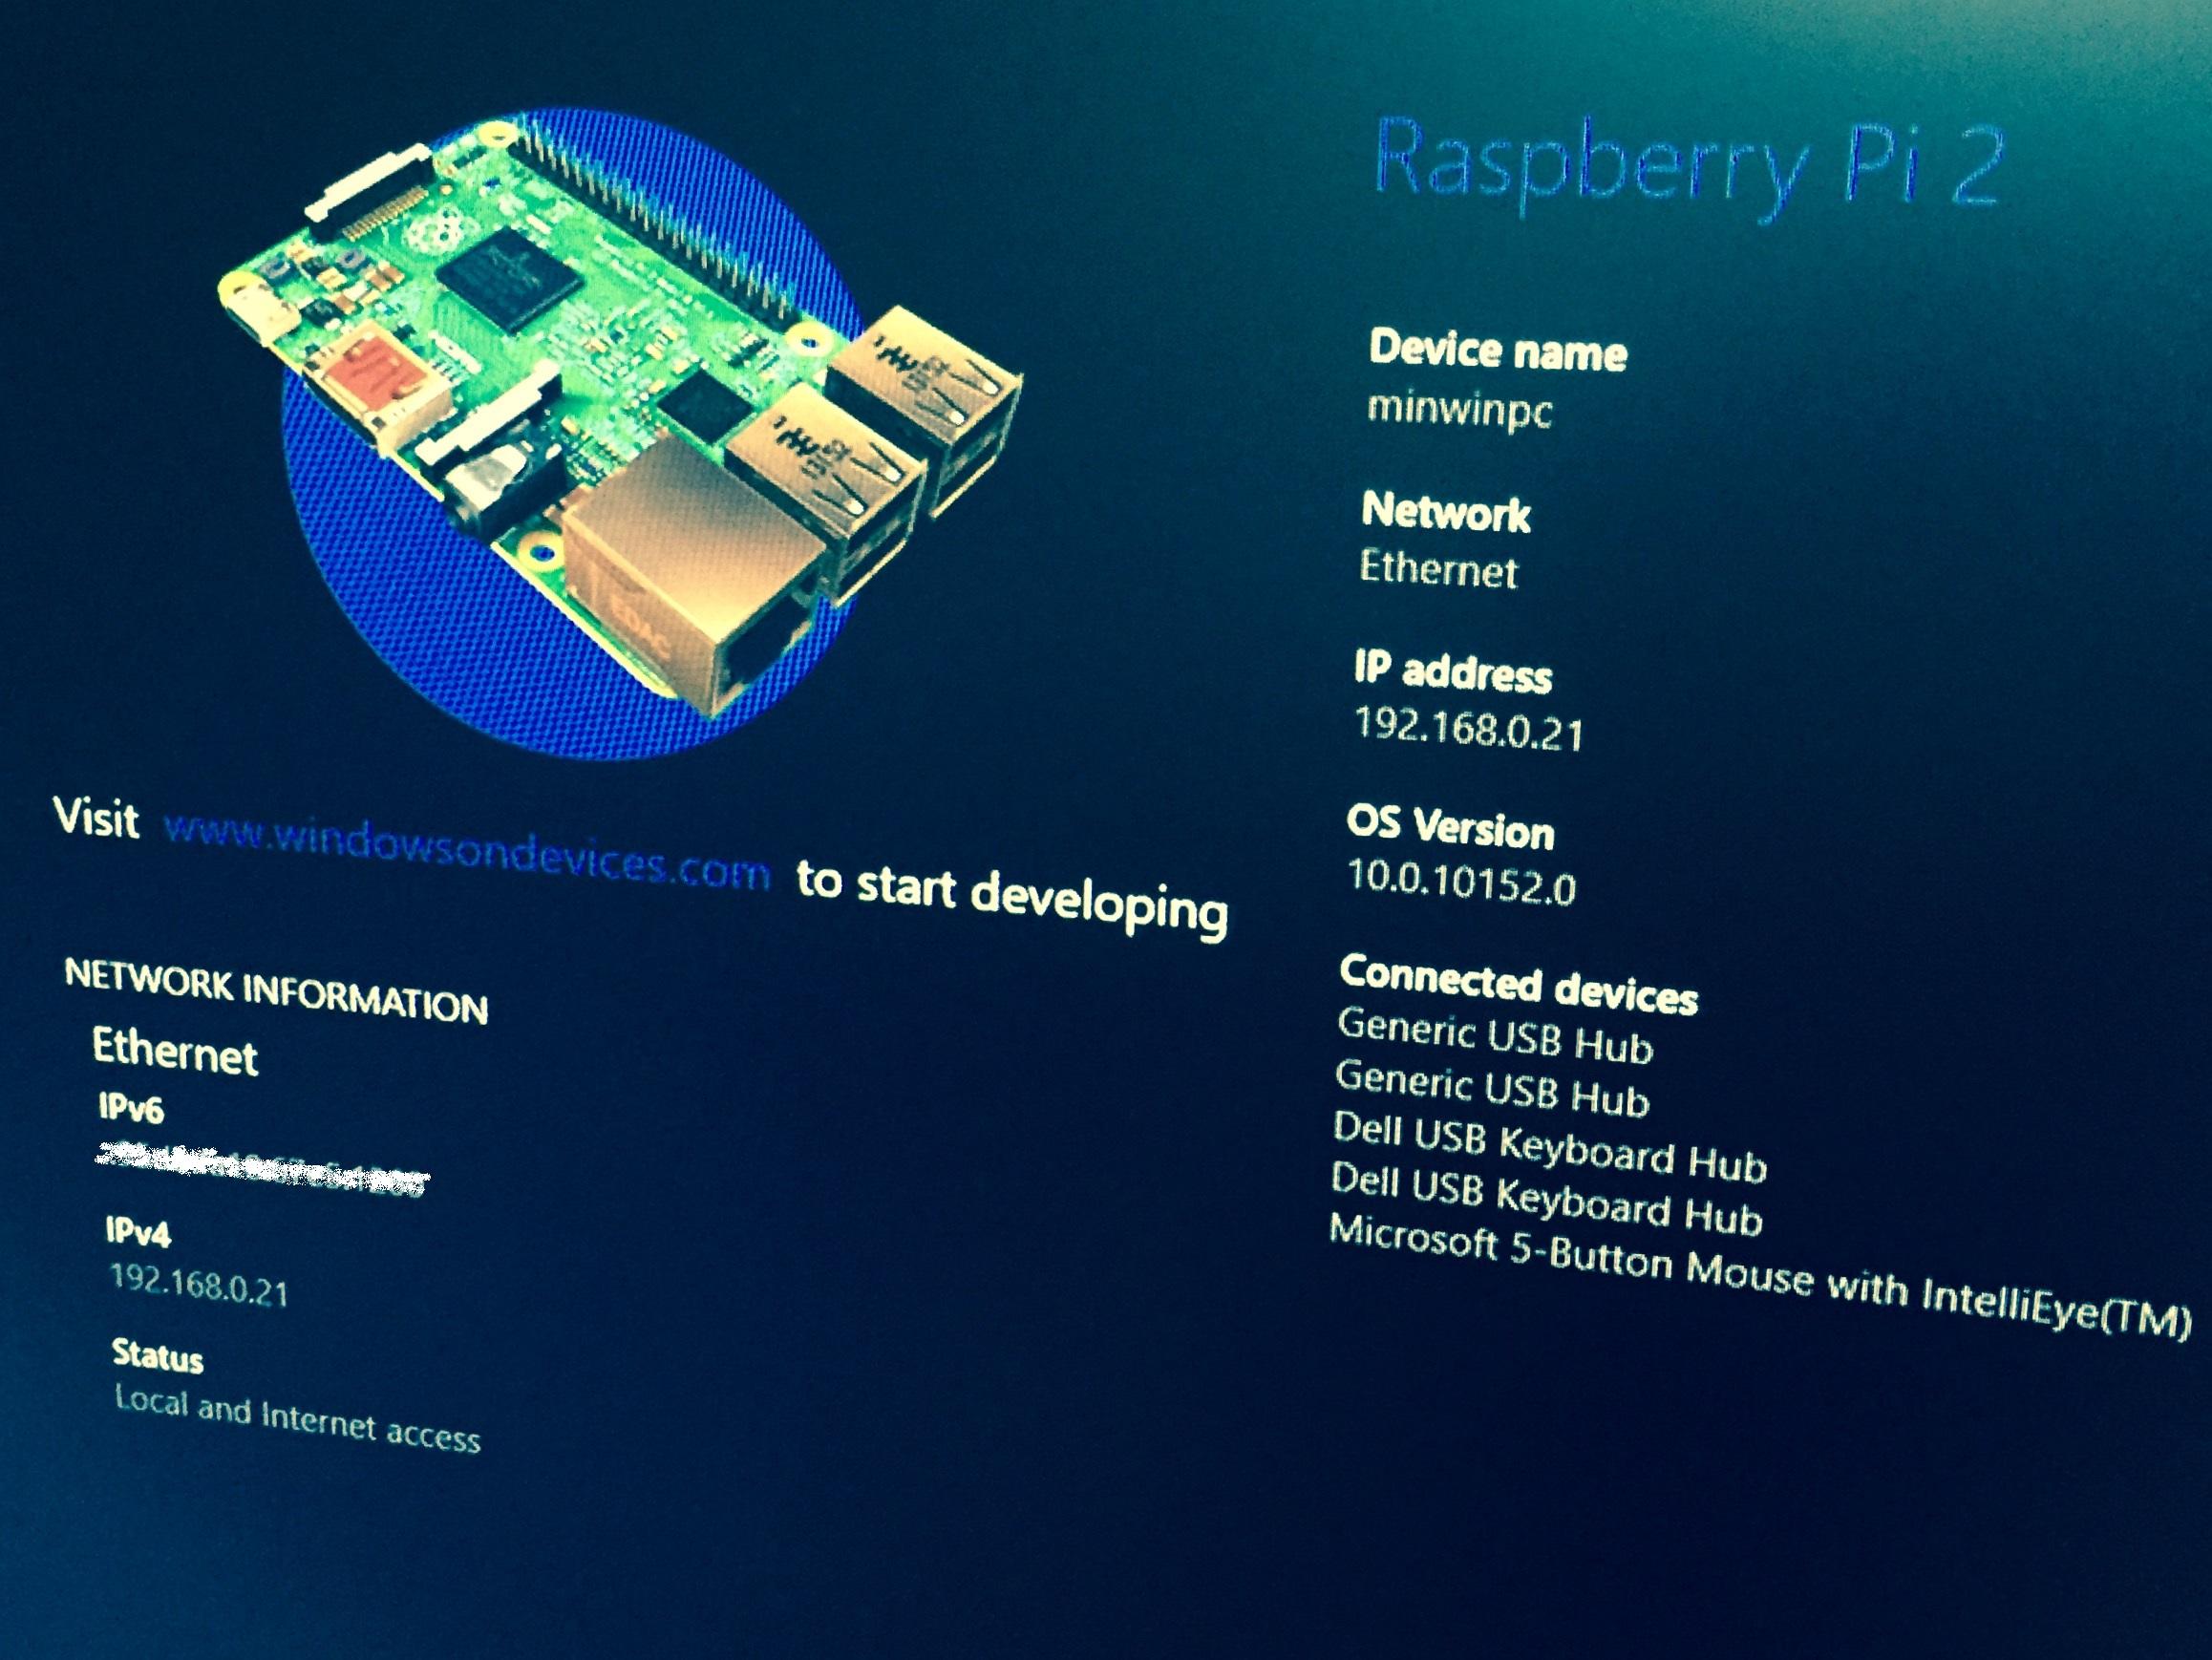 Windows 10 IoT Raspberry Pi 2 Setup Tutorial | Rob Steele